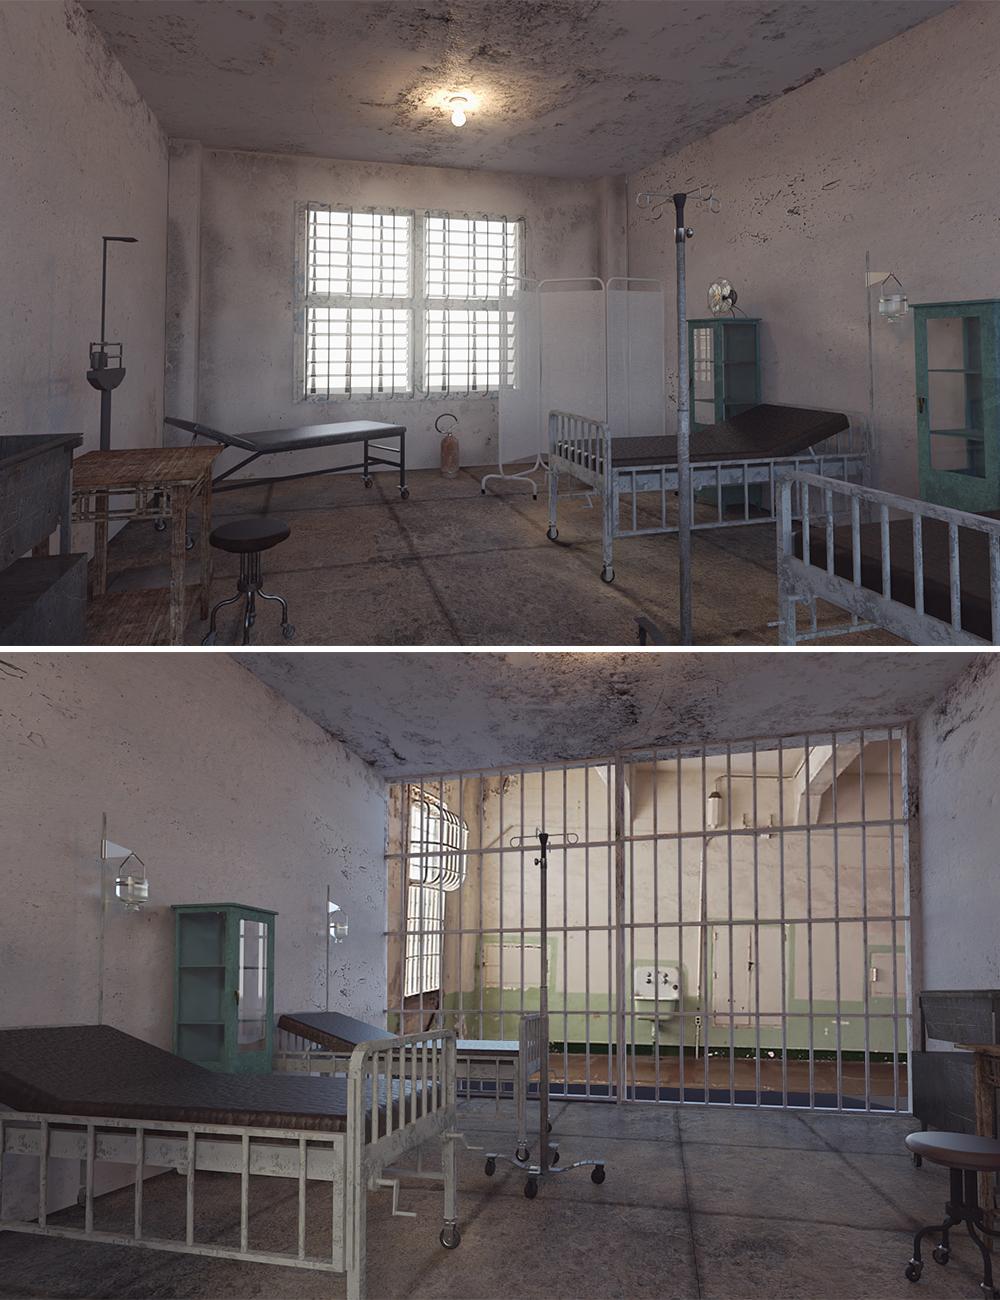 Alcatraz Hospital by: Digitallab3D, 3D Models by Daz 3D